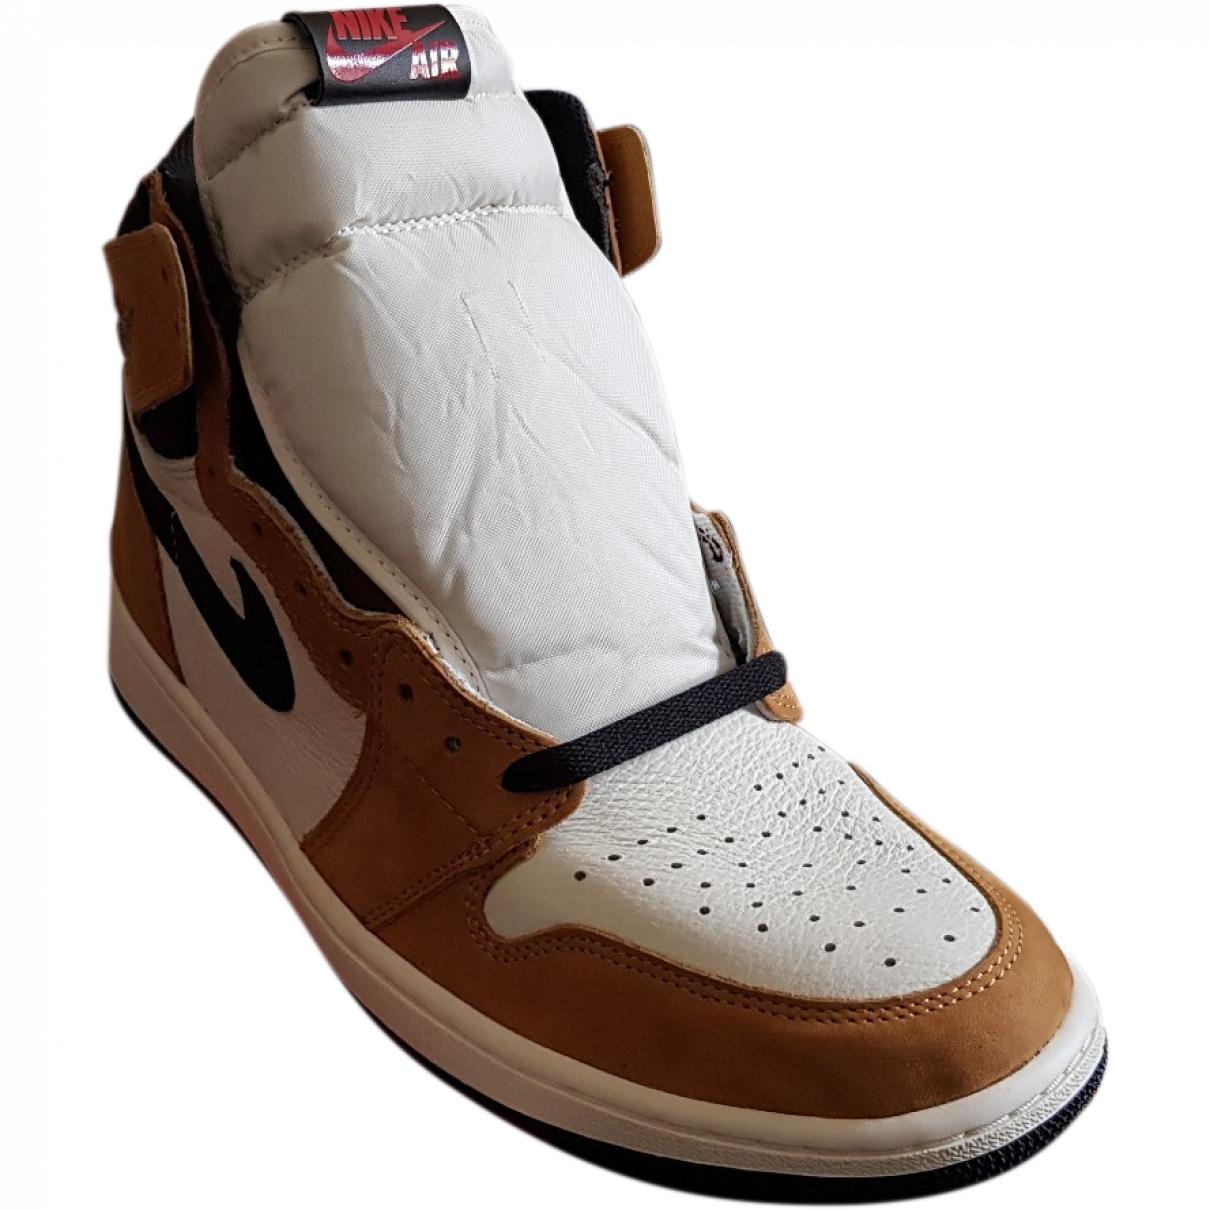 Jordan Air Jordan 1  Multicolour Leather Trainers for Men 13 US